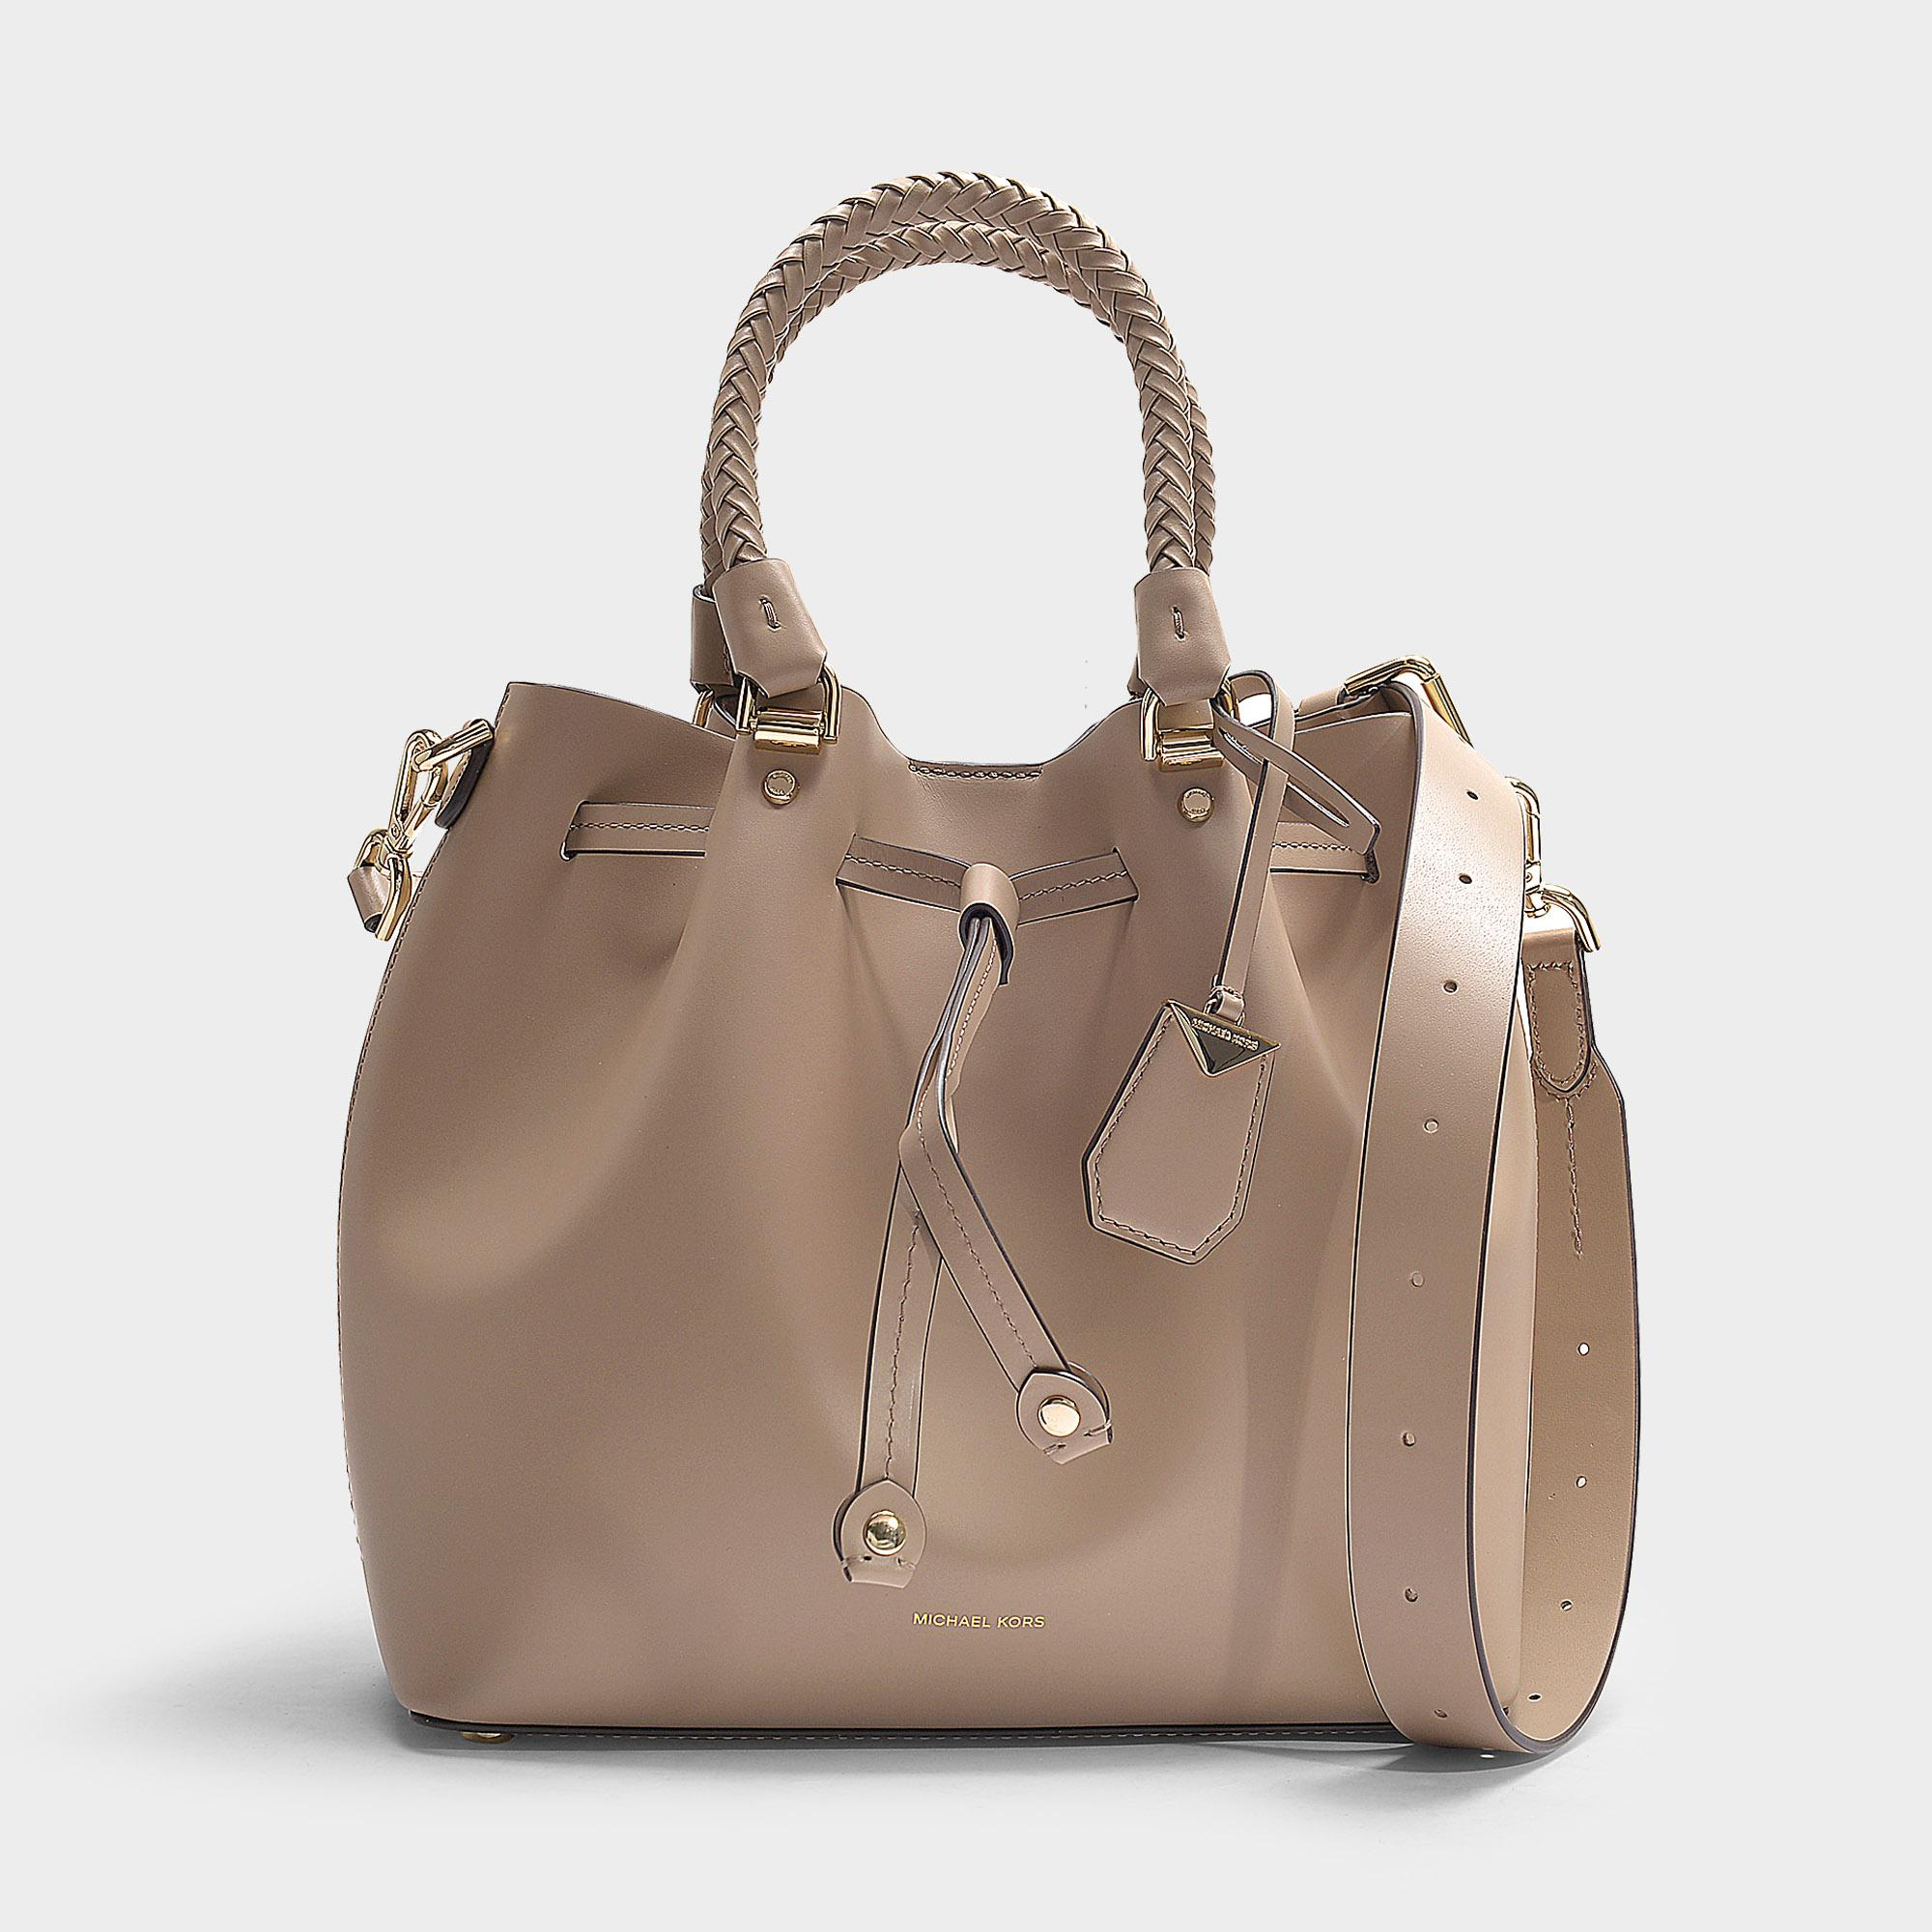 eaa1e1ab9f22 MICHAEL Michael Kors. Women's Natural Blakely Medium Bucket Bag In Truffle  Calfskin